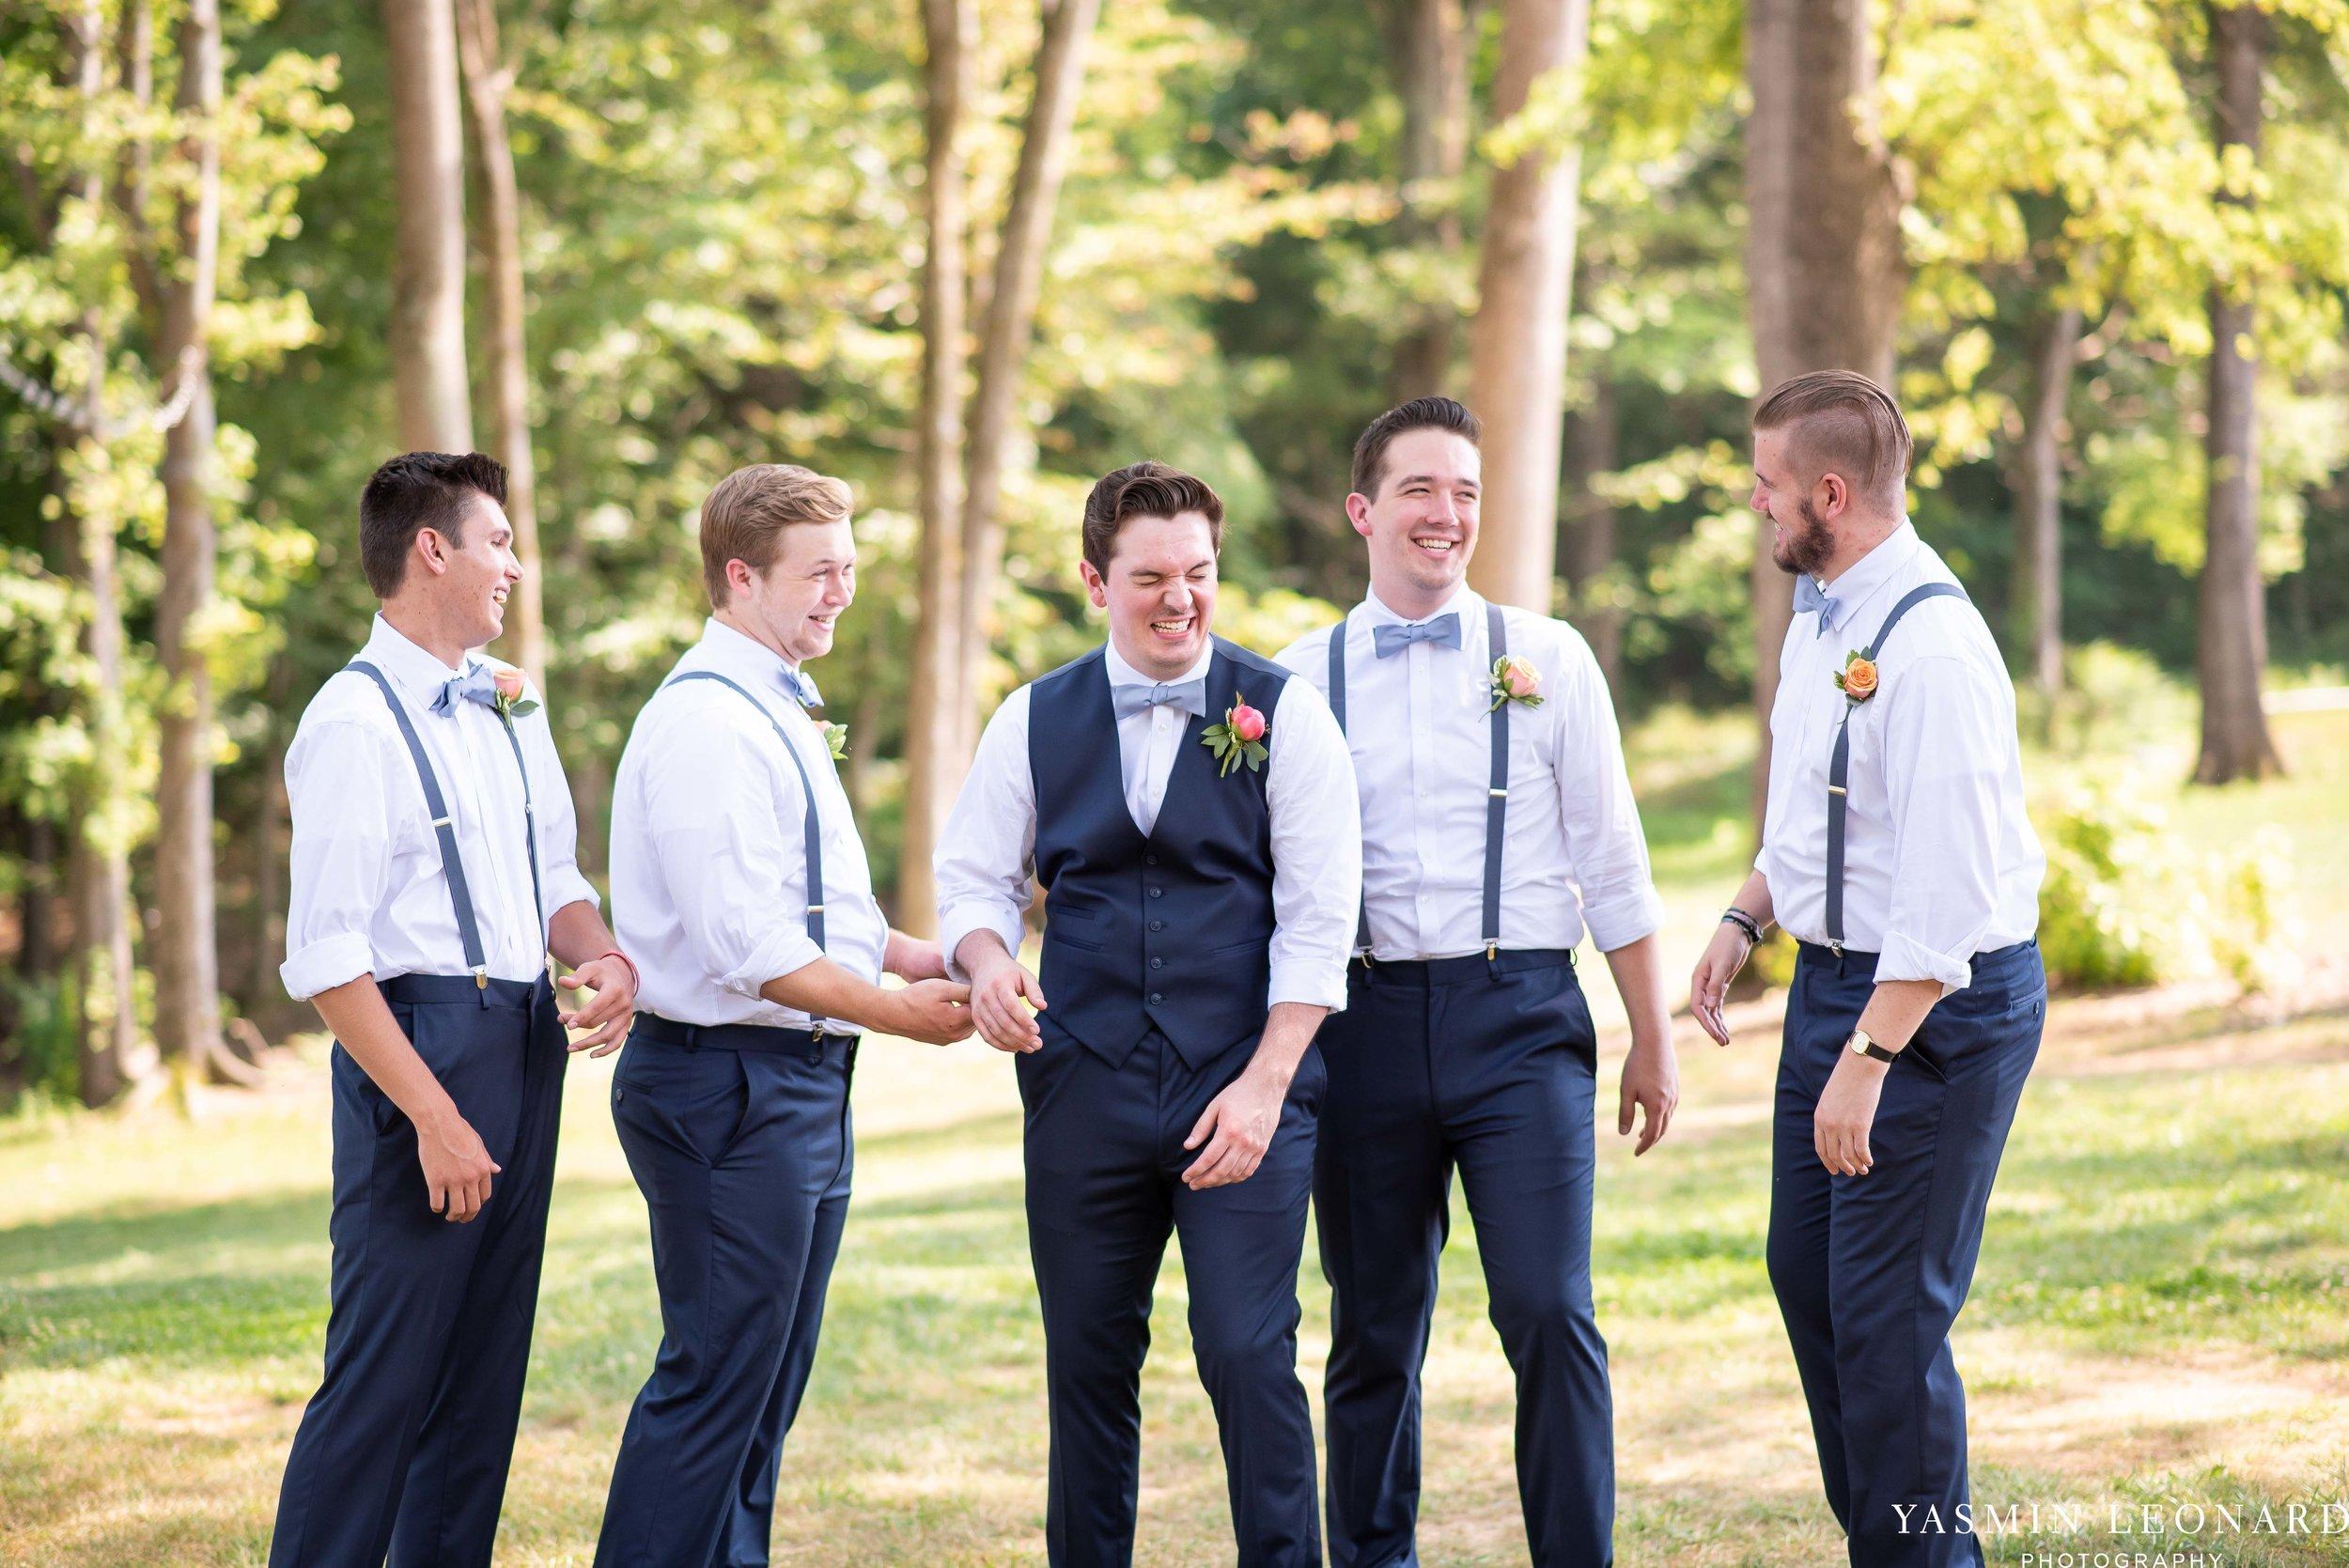 Old Homeplace Vineyard - NC Weddings - Outdoor Summer Weddings - Peony Boutique - Vineyard Wedding - NC Photographer - Yasmin Leonard Photography-18.jpg